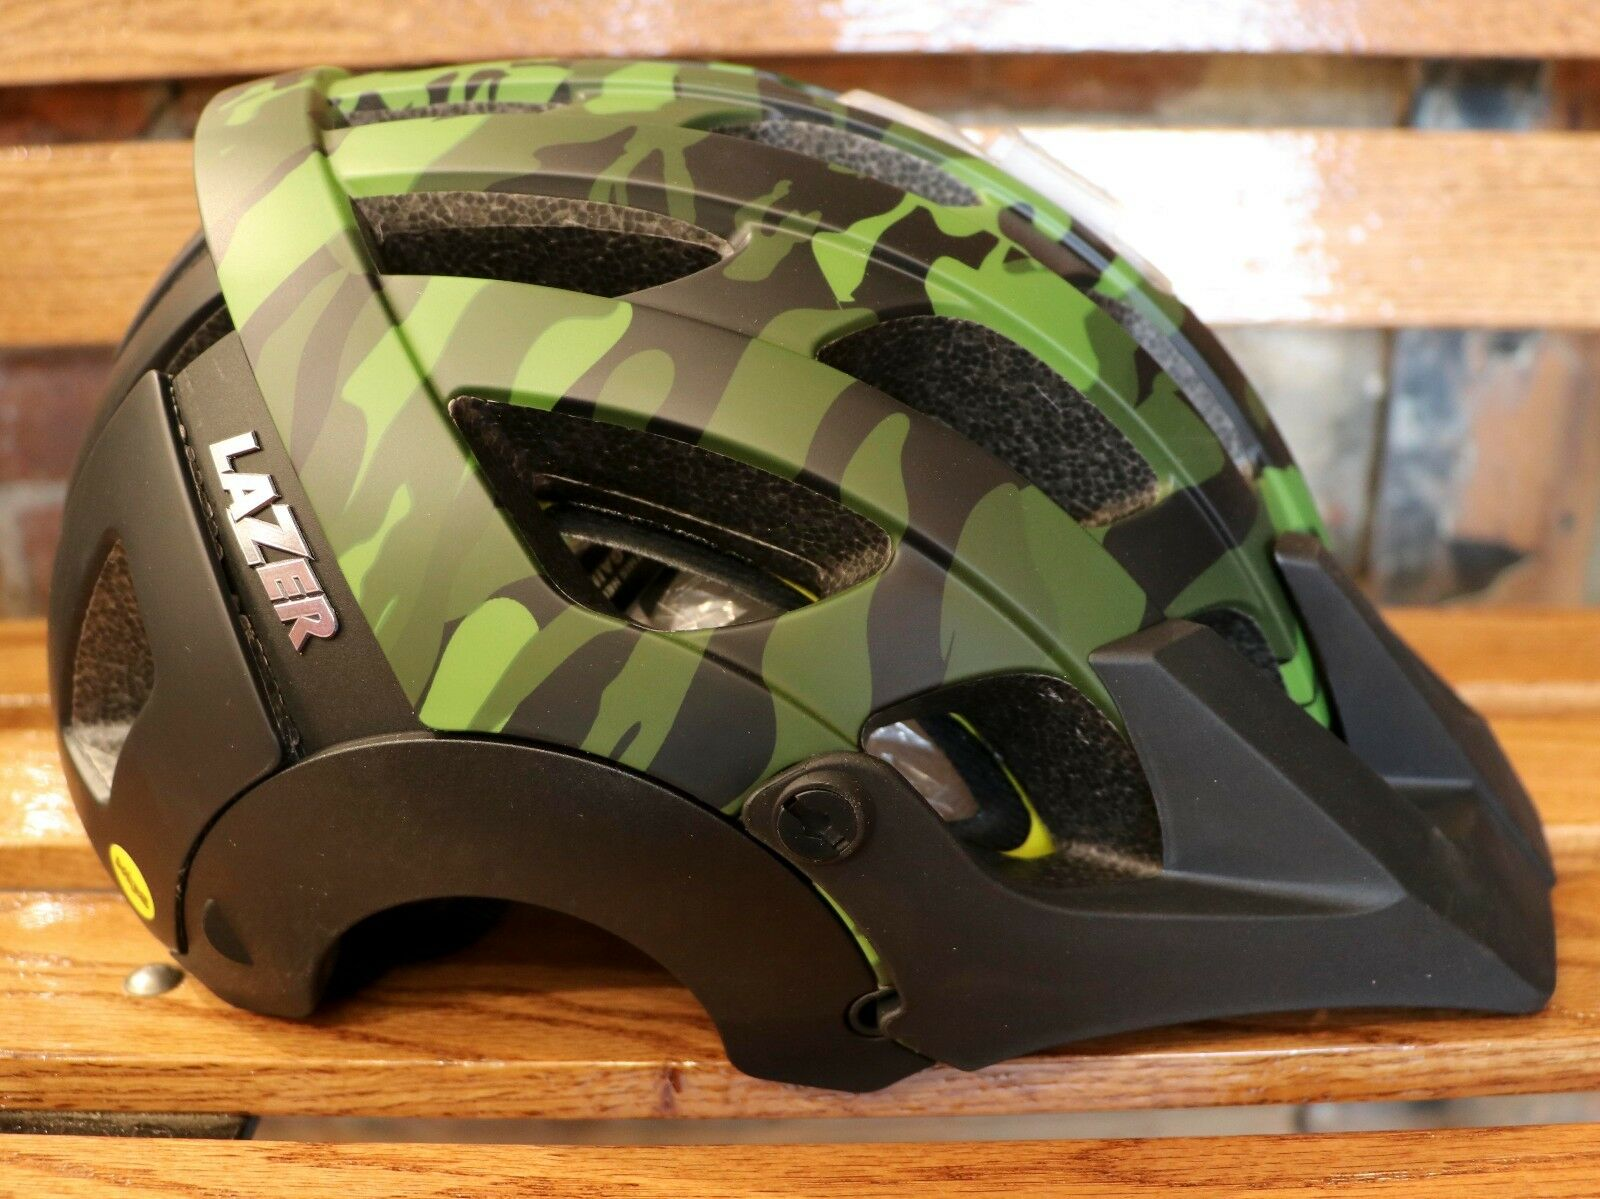 NEW Lazer Revolution MIPS Bike Helmet – color   Camo   Size  Small (52-56 cm.)  100% free shipping